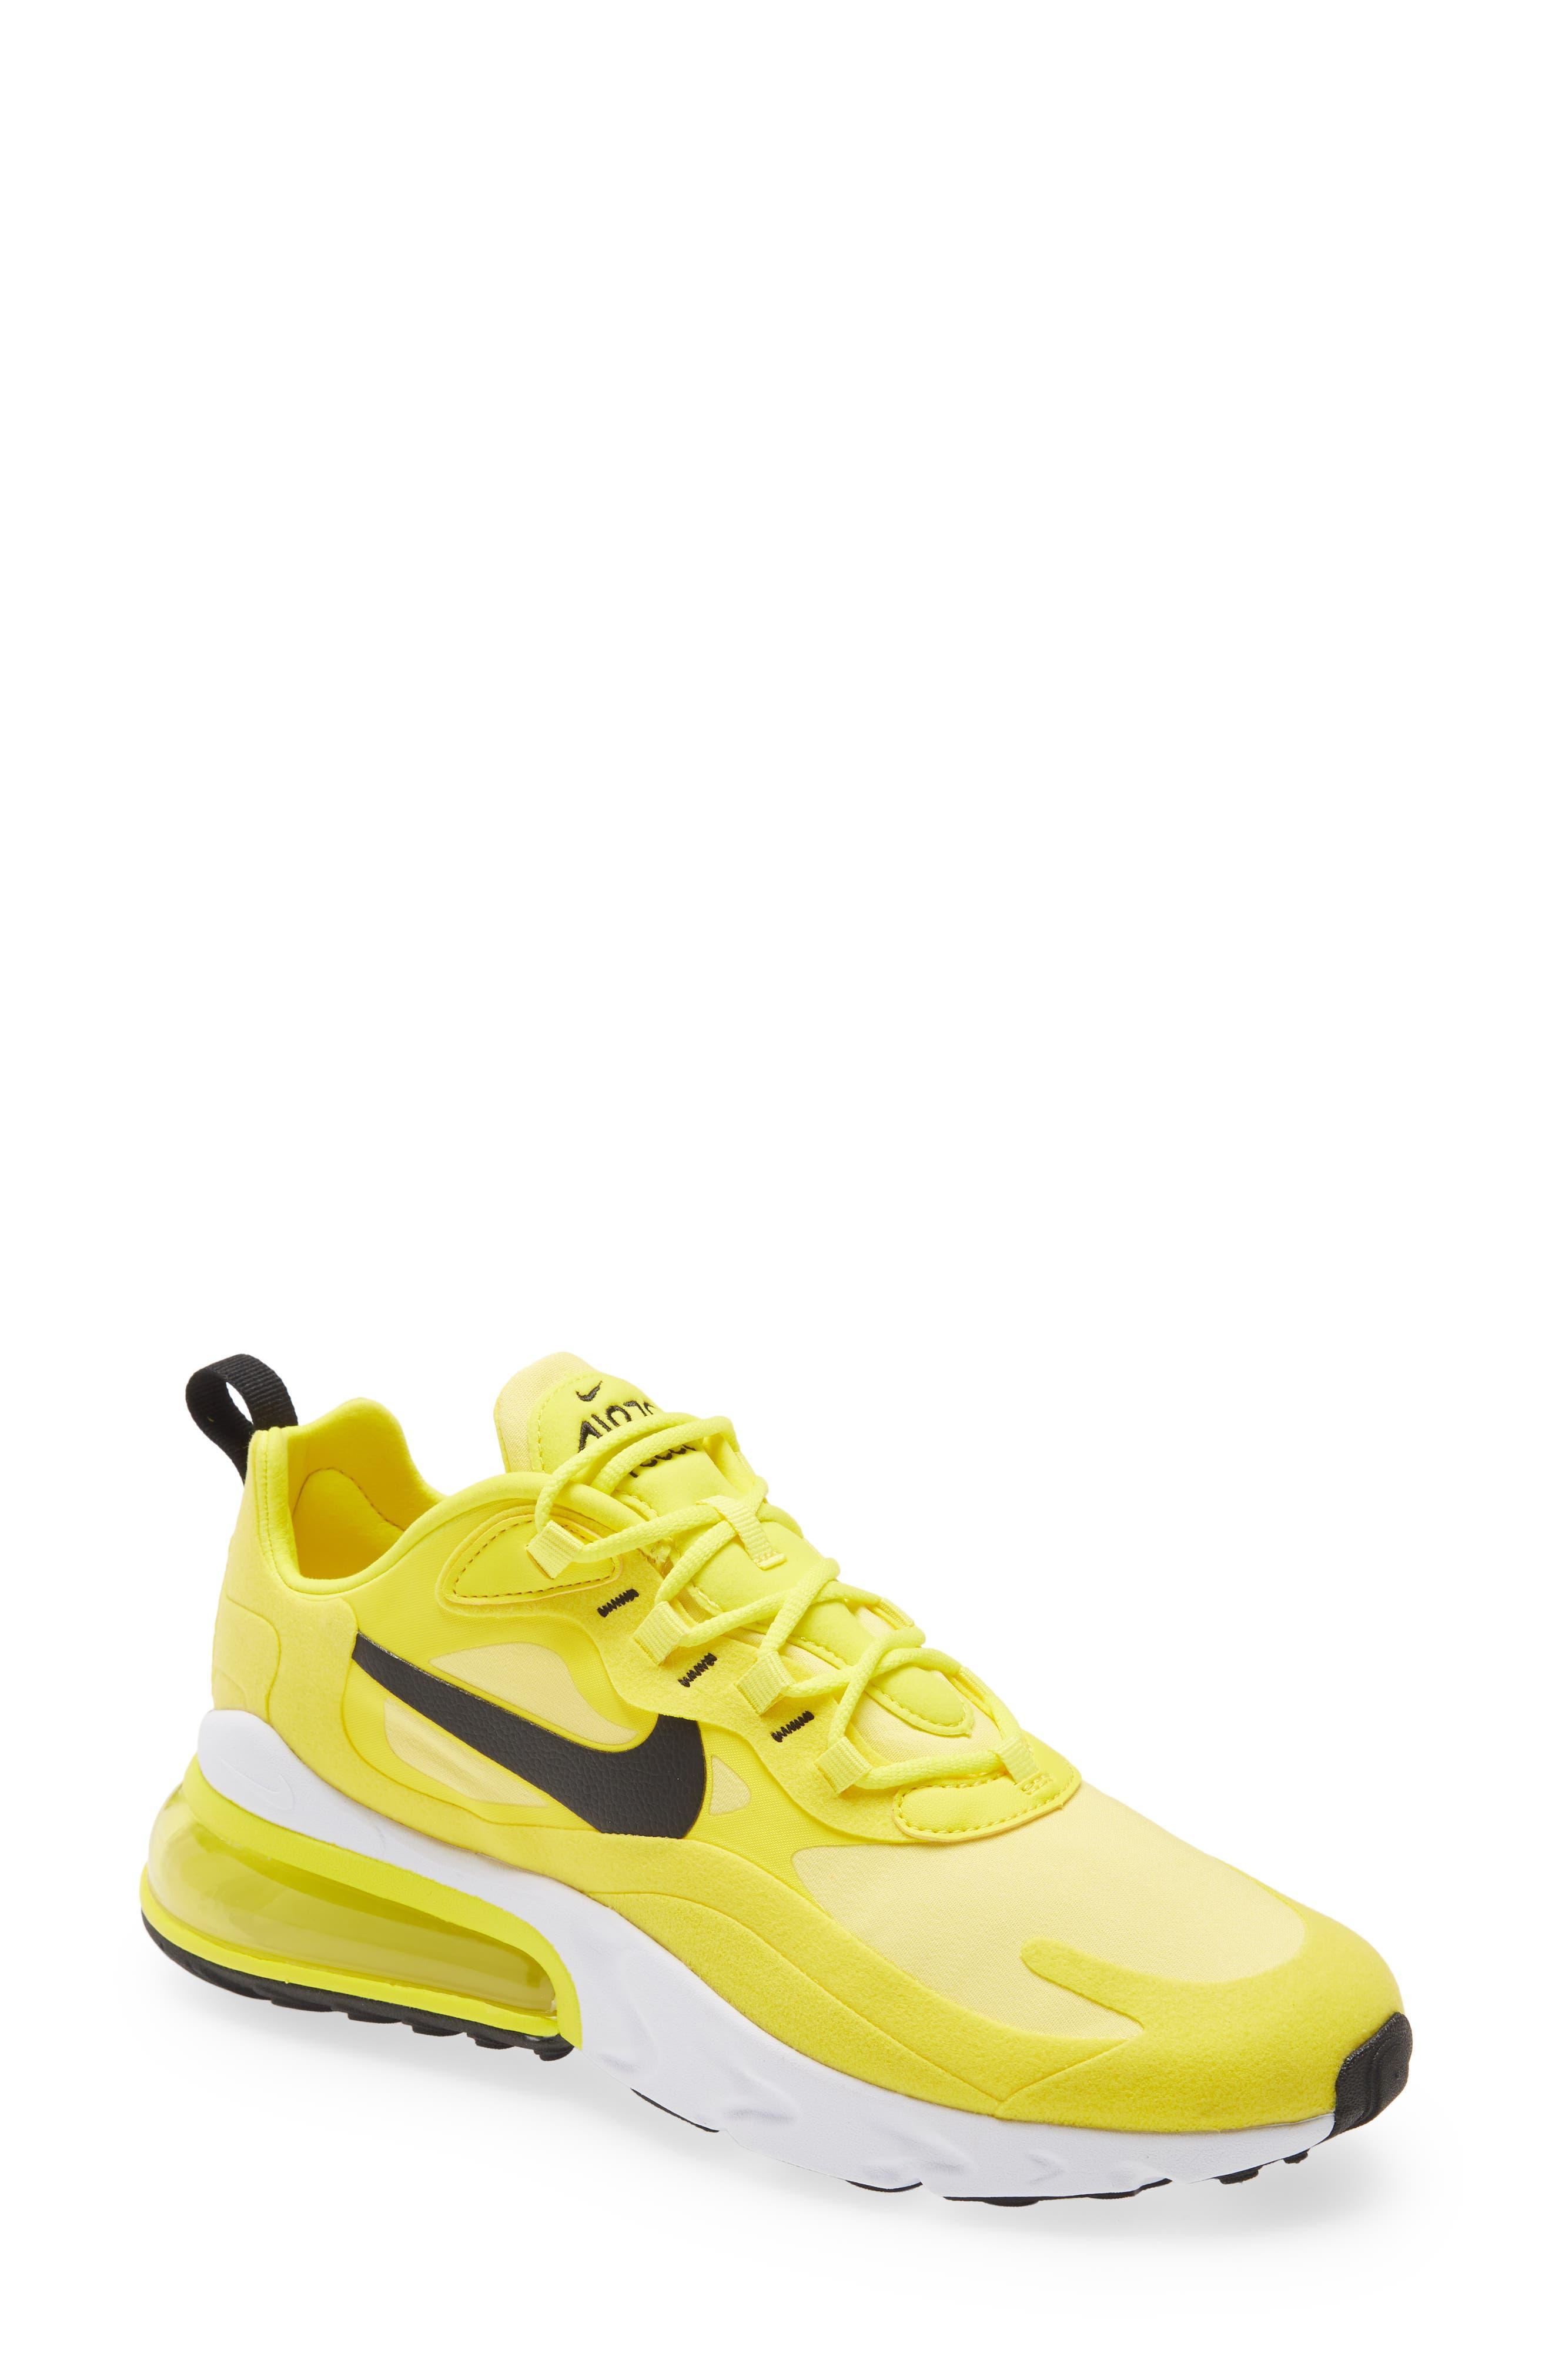 Nike Air Max 270 React Sneaker (Women